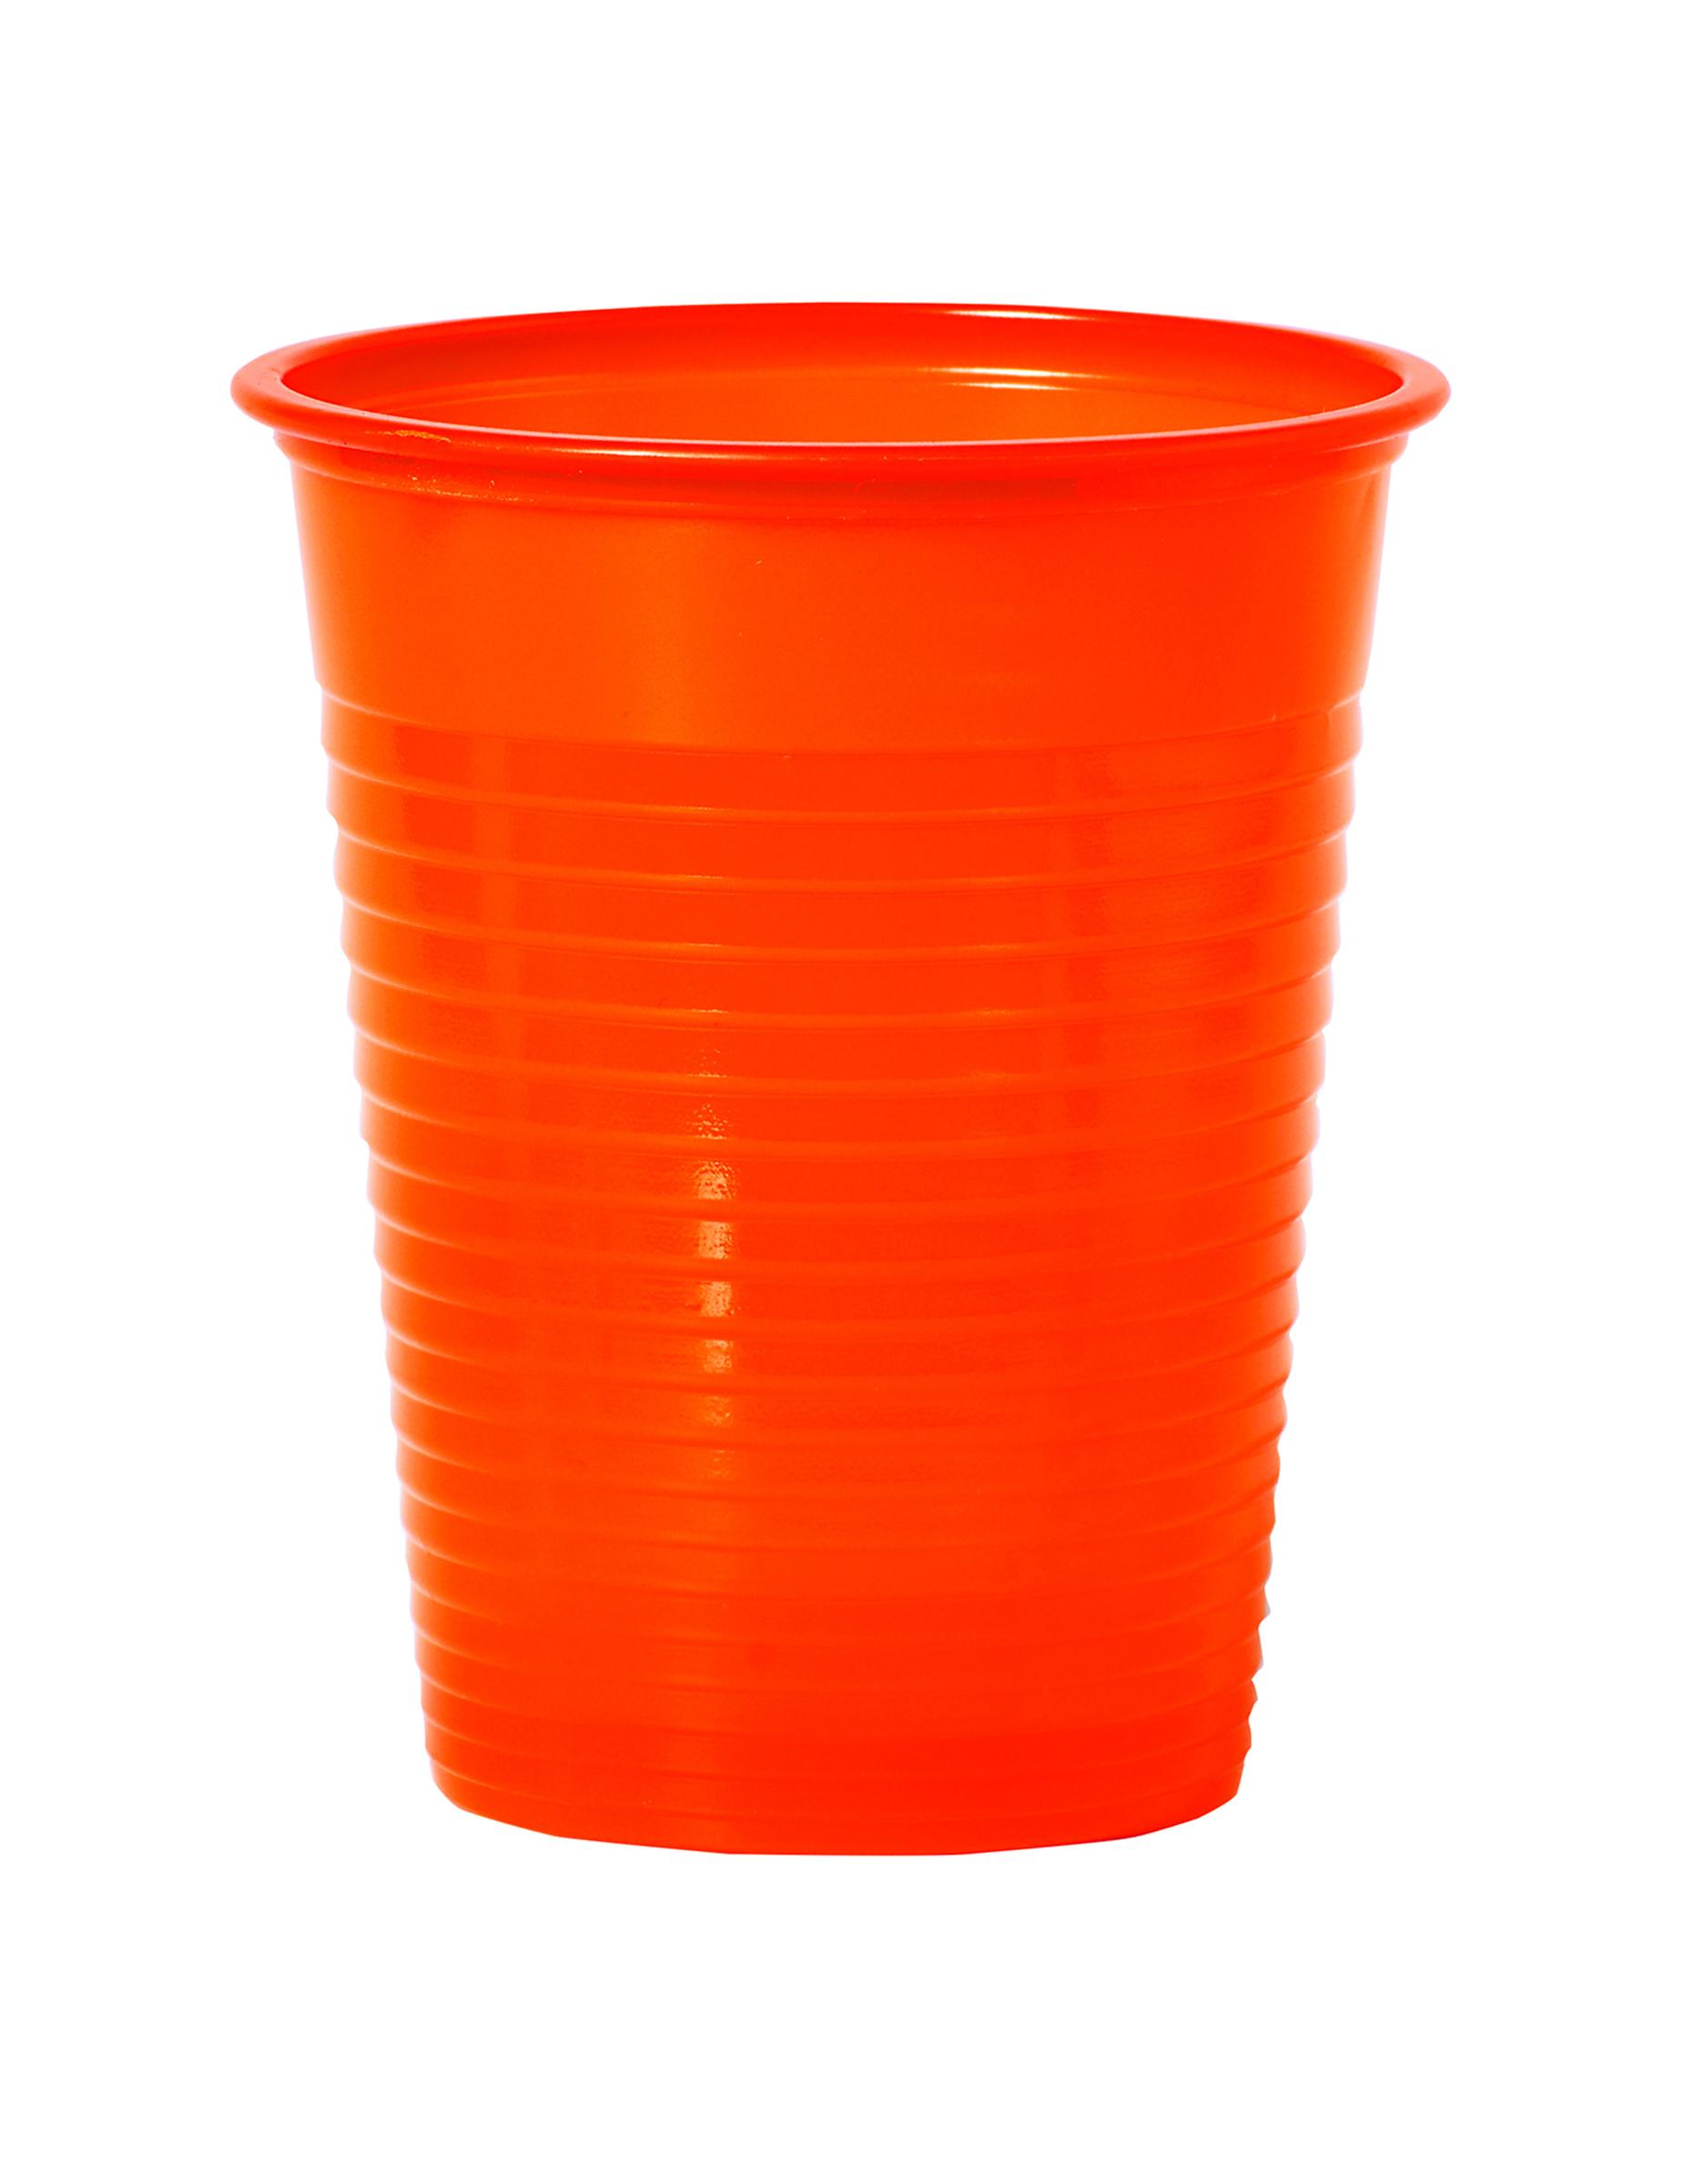 50 bicchieri di plastica arancioni addobbi e vestiti di for Addobbi natalizi con bicchieri di plastica